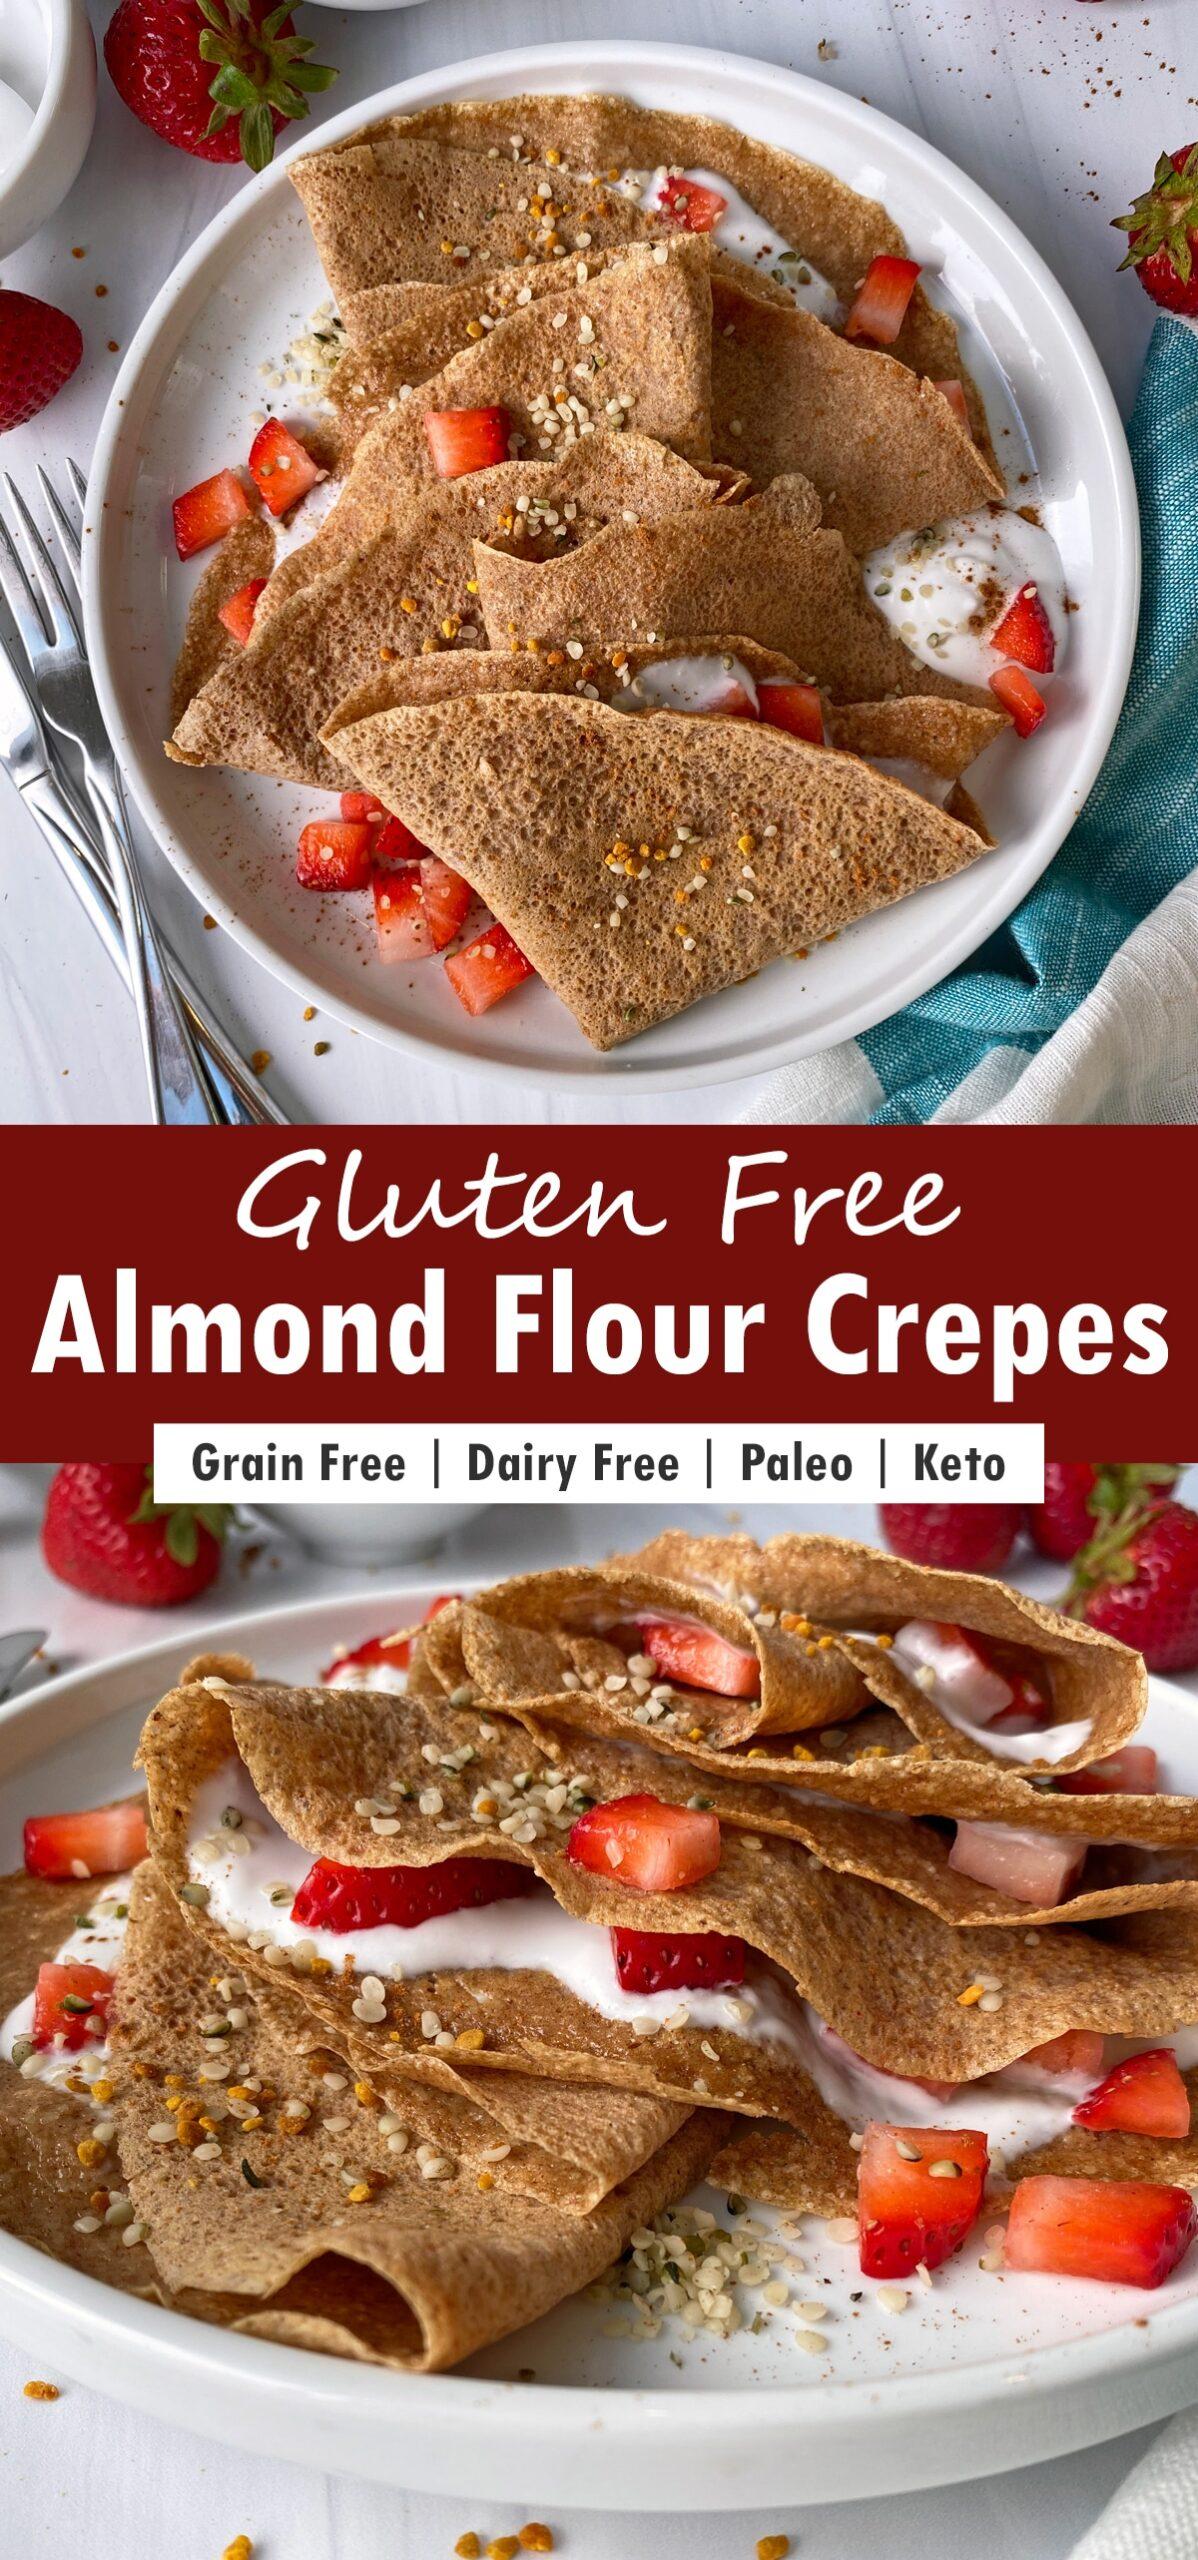 gluten-free-almond-flour-crepes-recipe